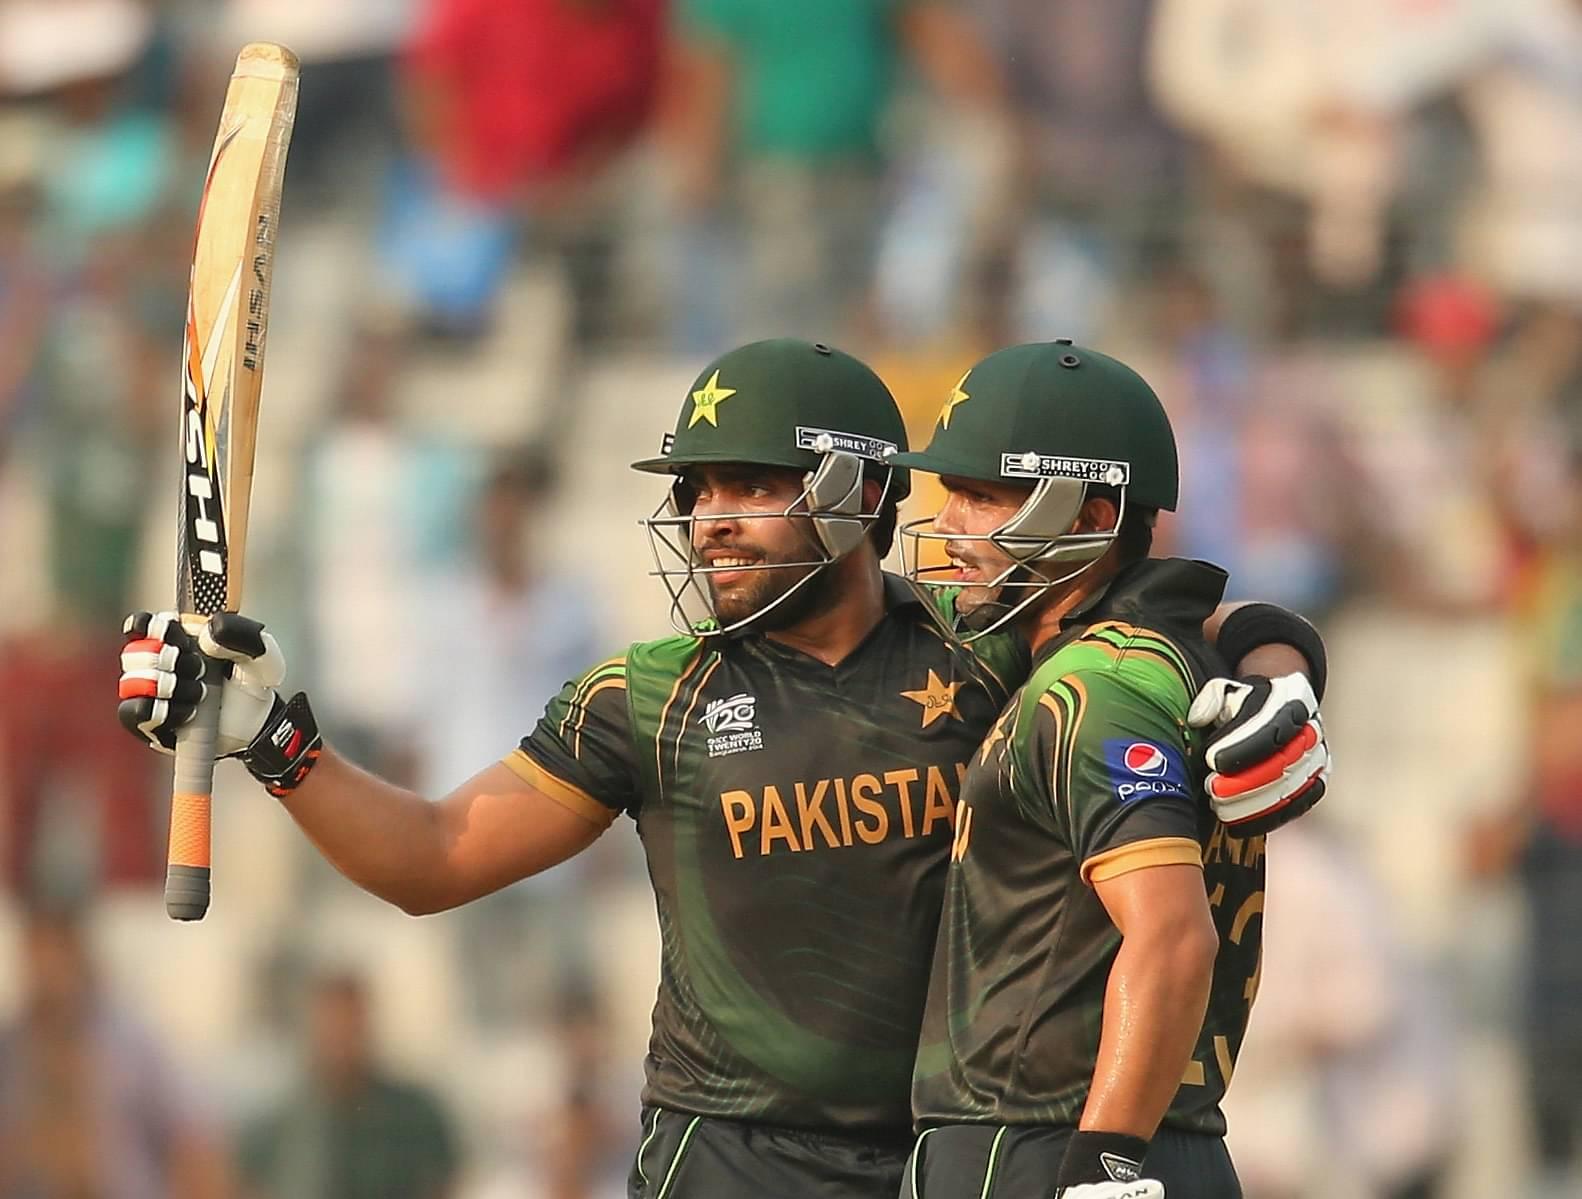 Kamran Akmal misses Umar Akmal's stumping chance